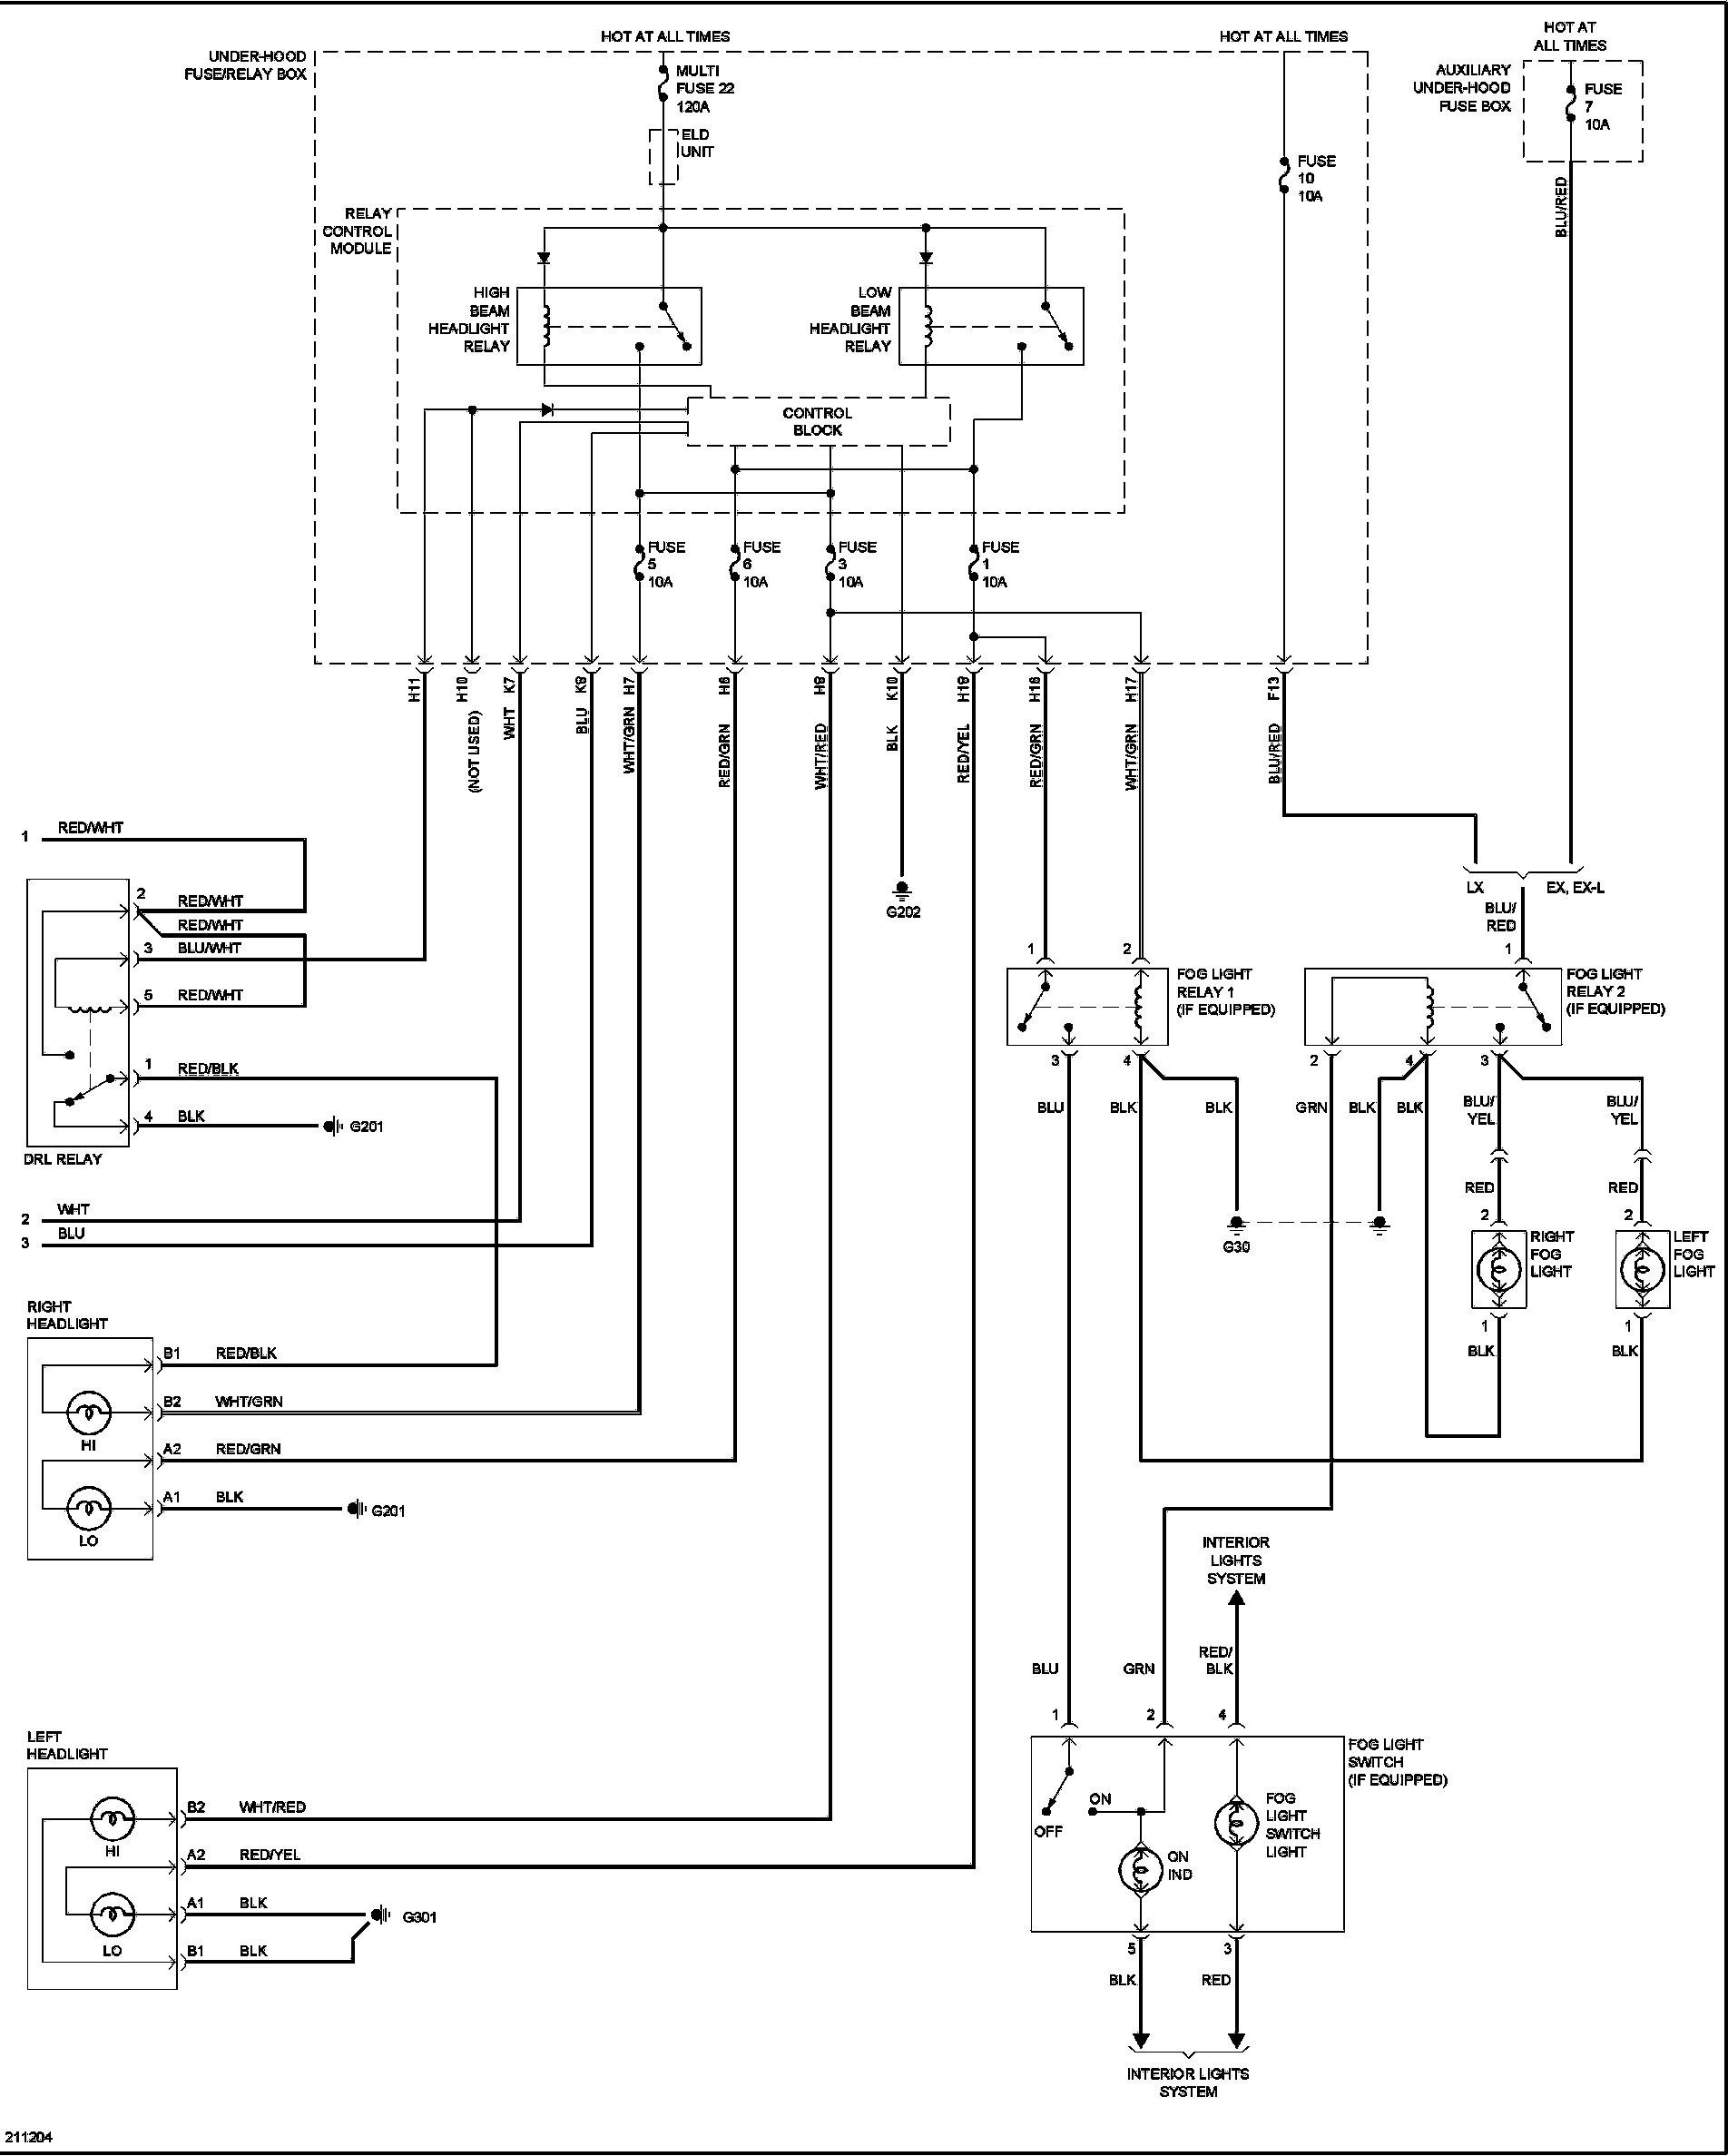 95 Honda Accord Engine Diagram 1995 Honda Odyssey Wiring Diagrams Wiring Data Of 95 Honda Accord Engine Diagram